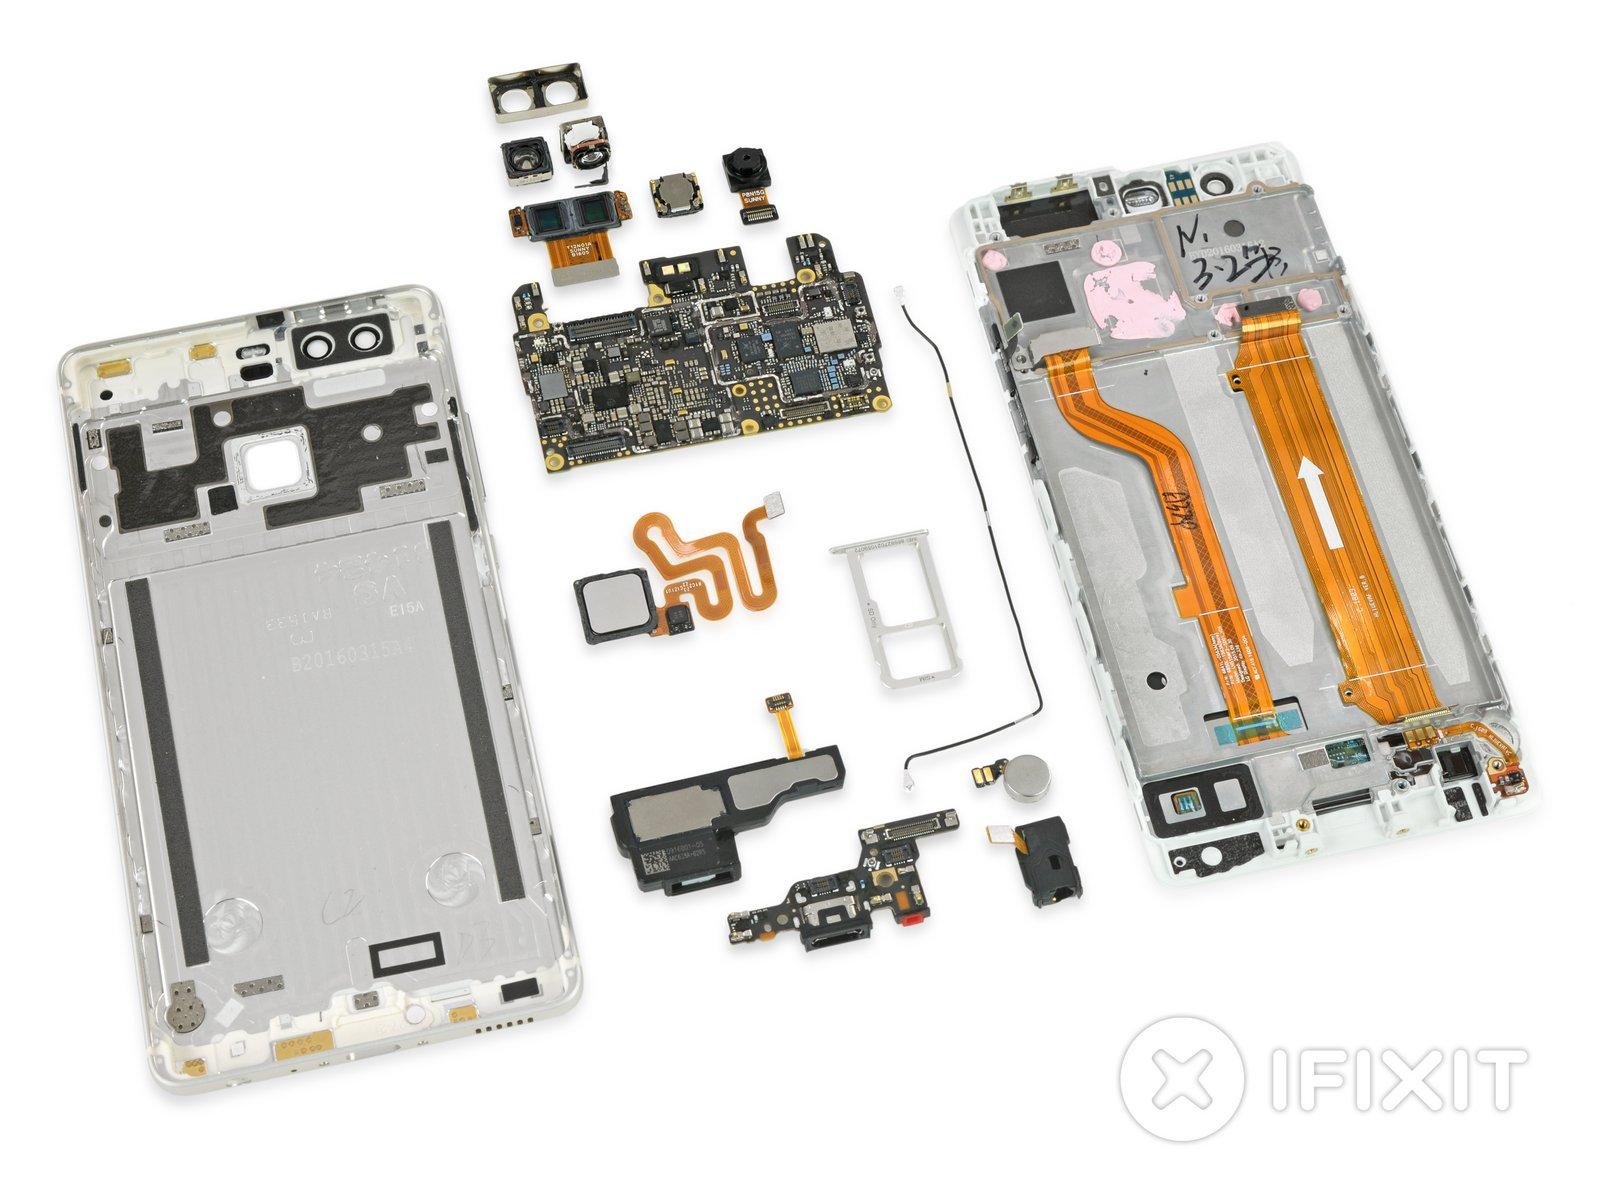 Huawei P9 Teardown - iFixit